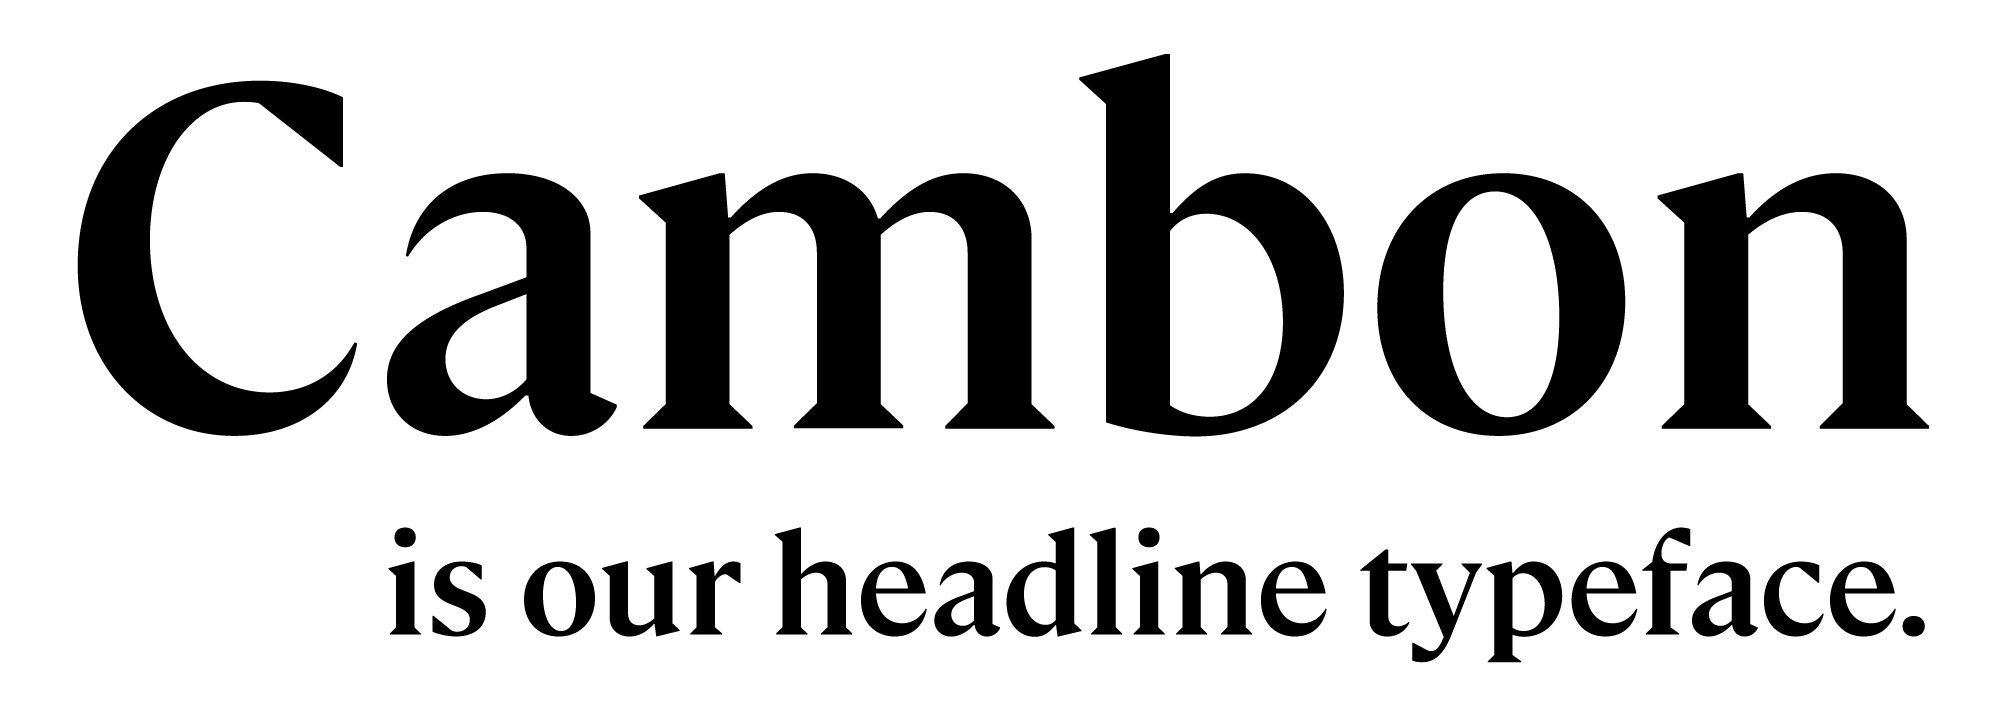 cambon-title